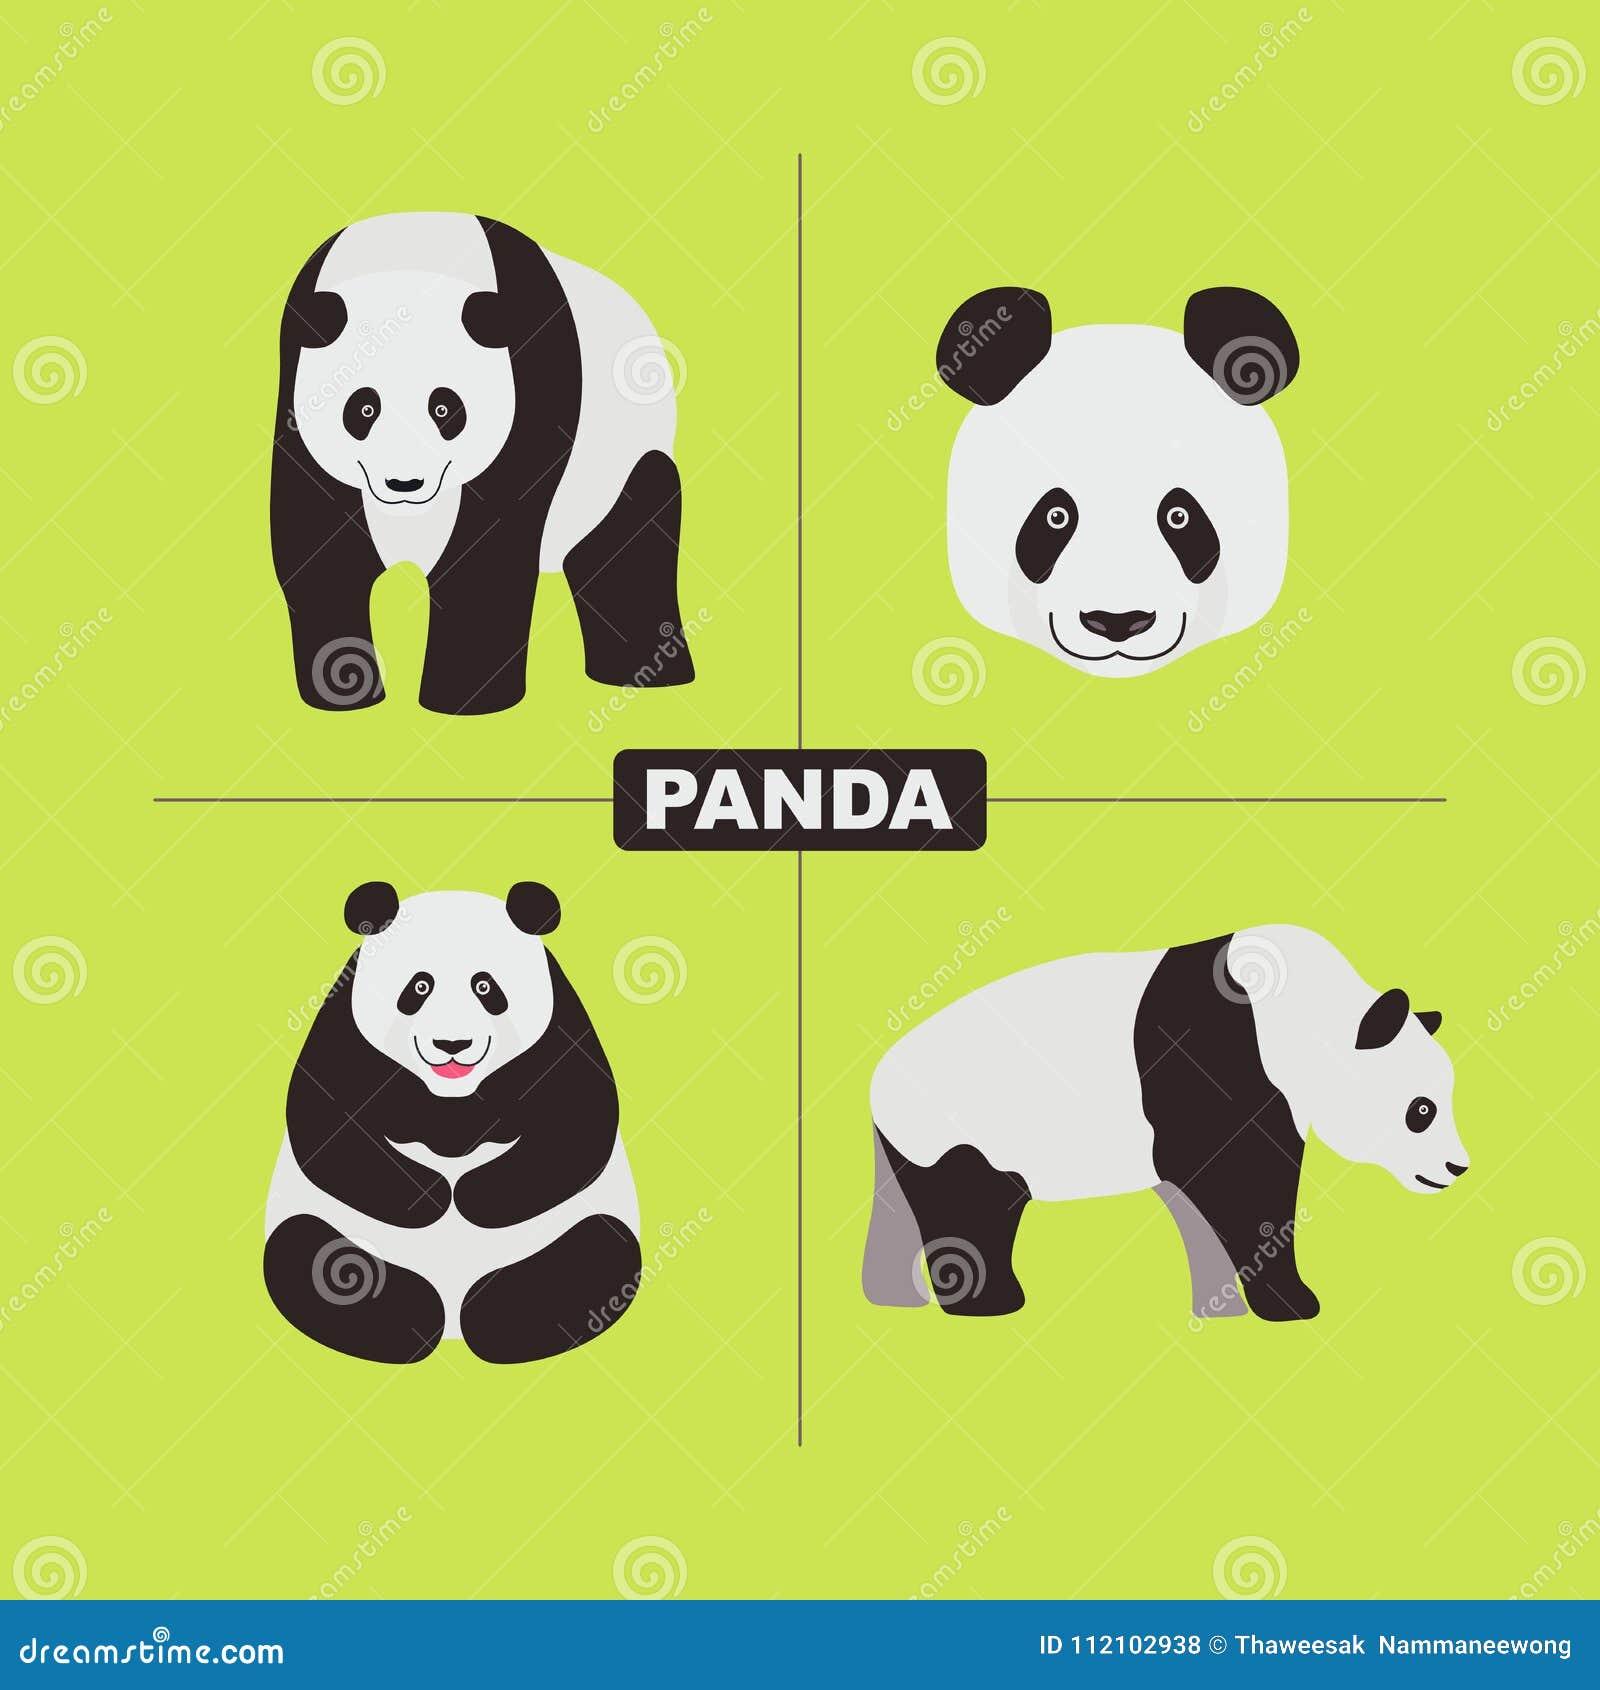 Panda Wildlife Chinese Animal